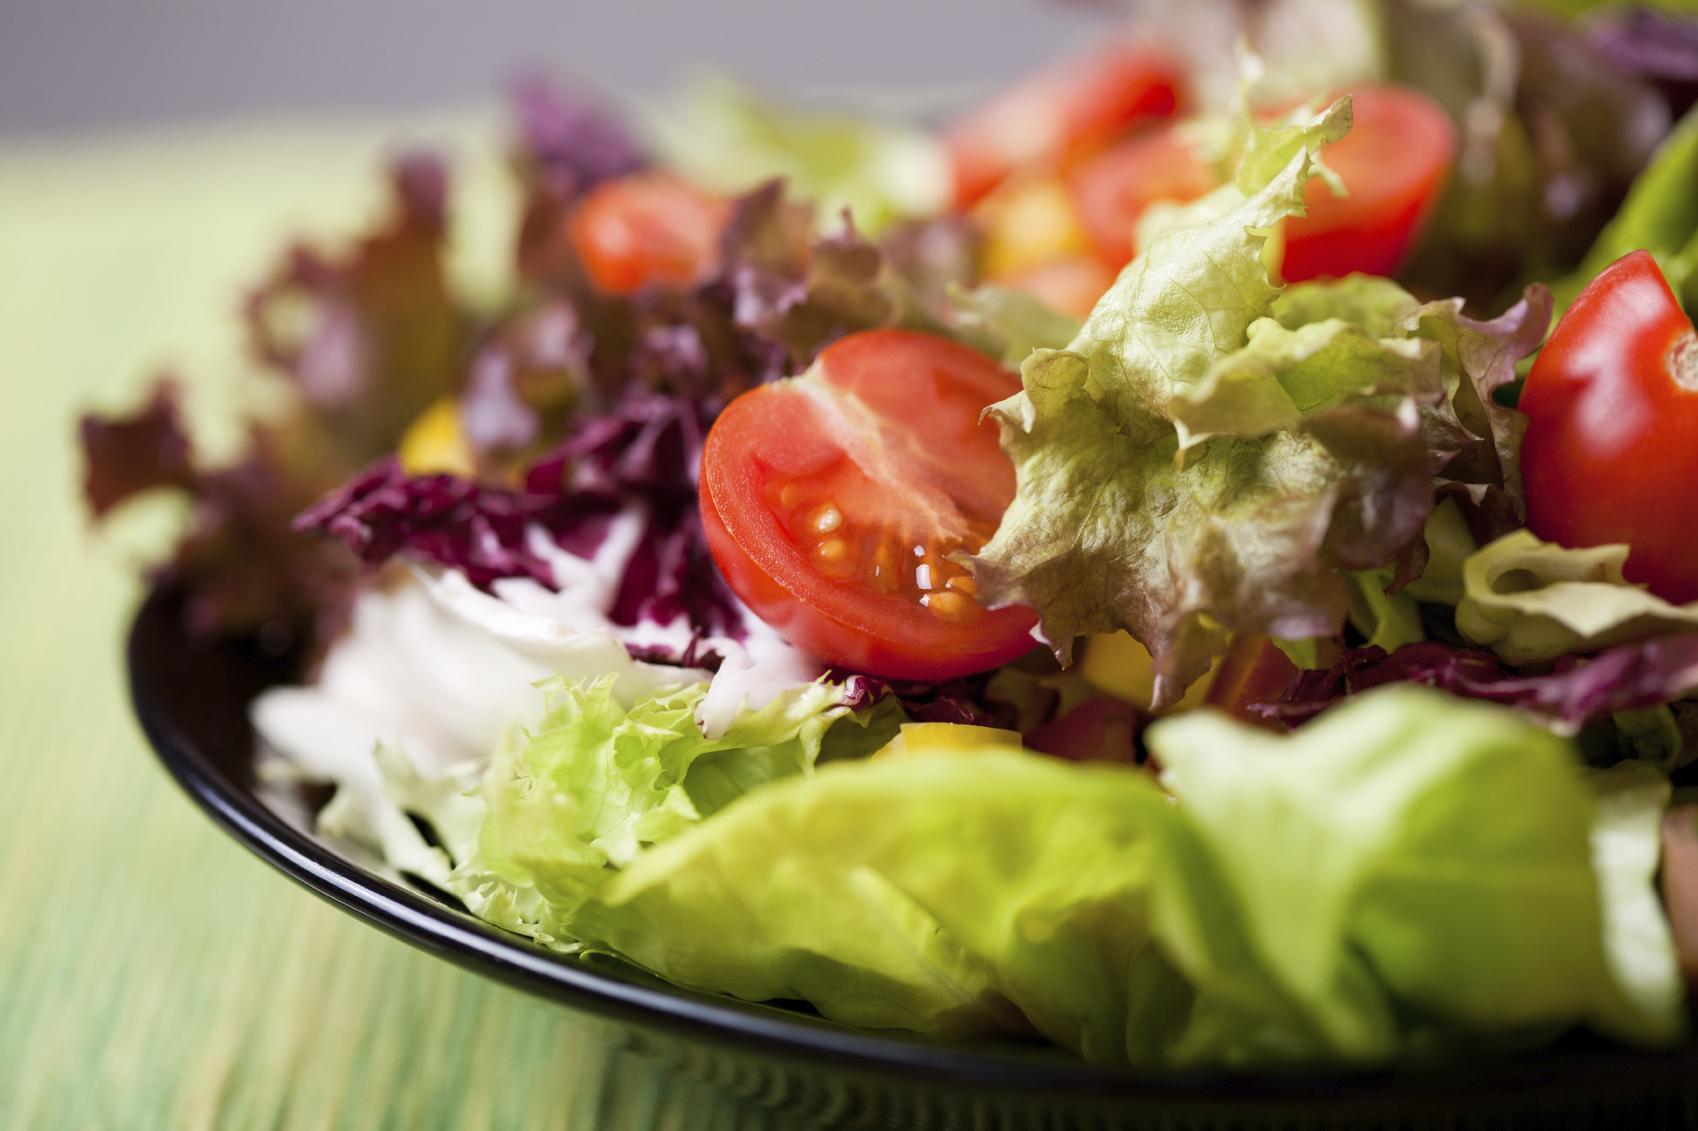 Ensalada vegetariana con salsa especial